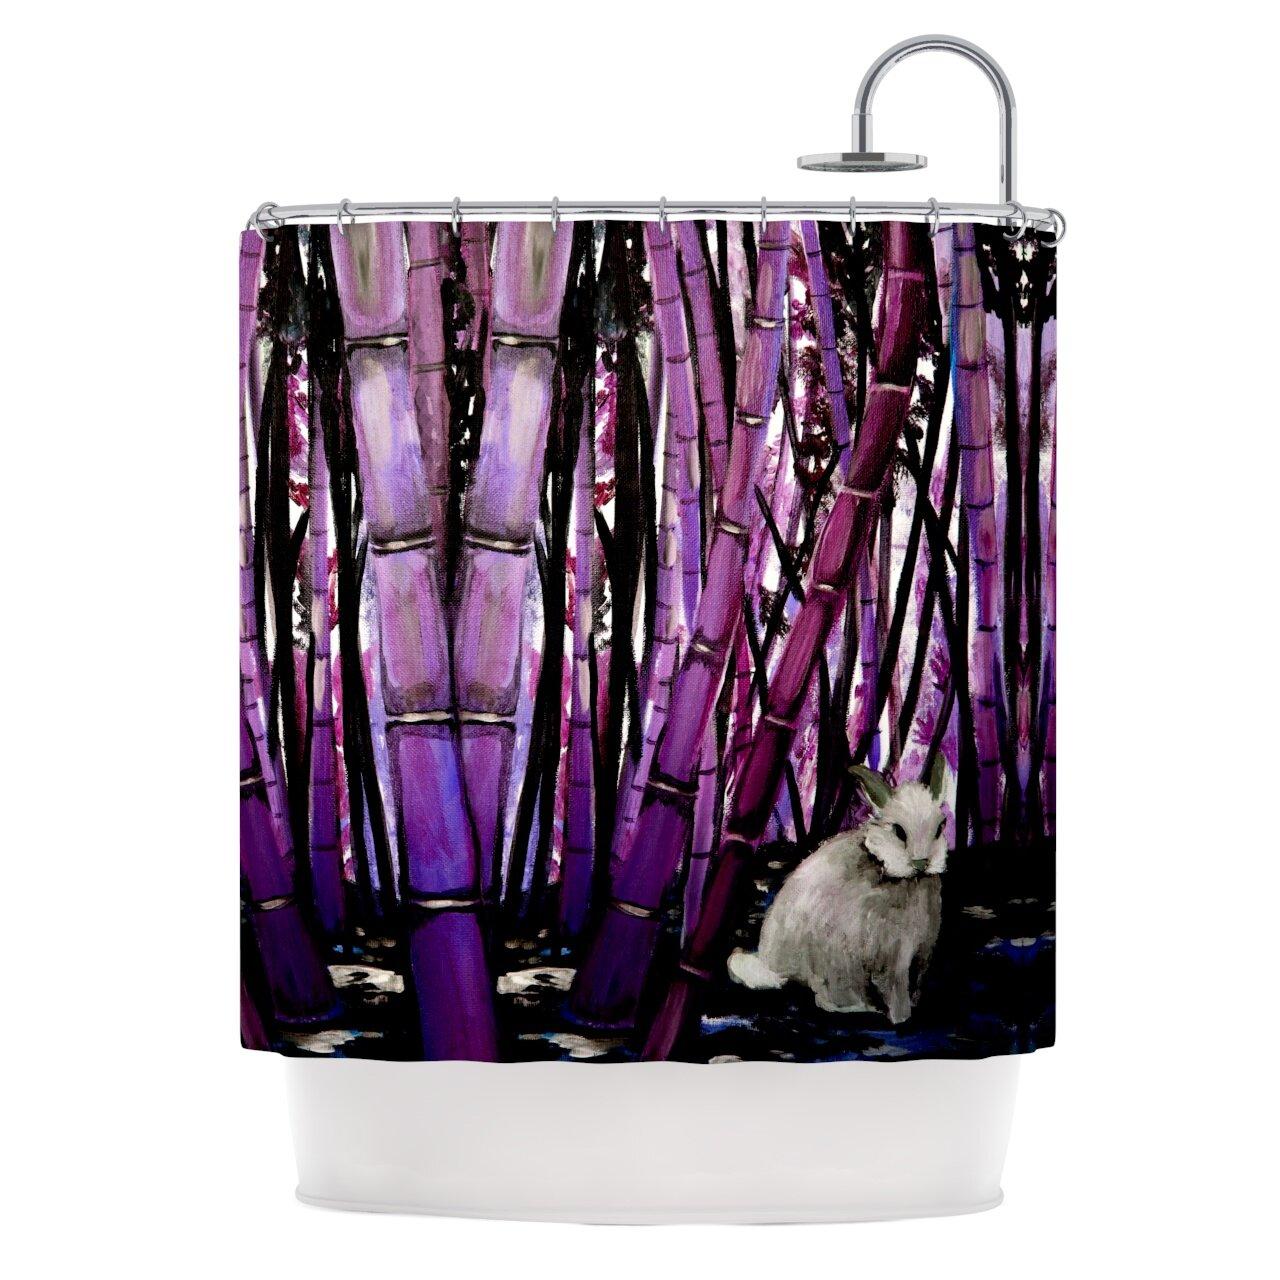 KESS InHouse Bamboo Bunny Shower Curtain Reviews